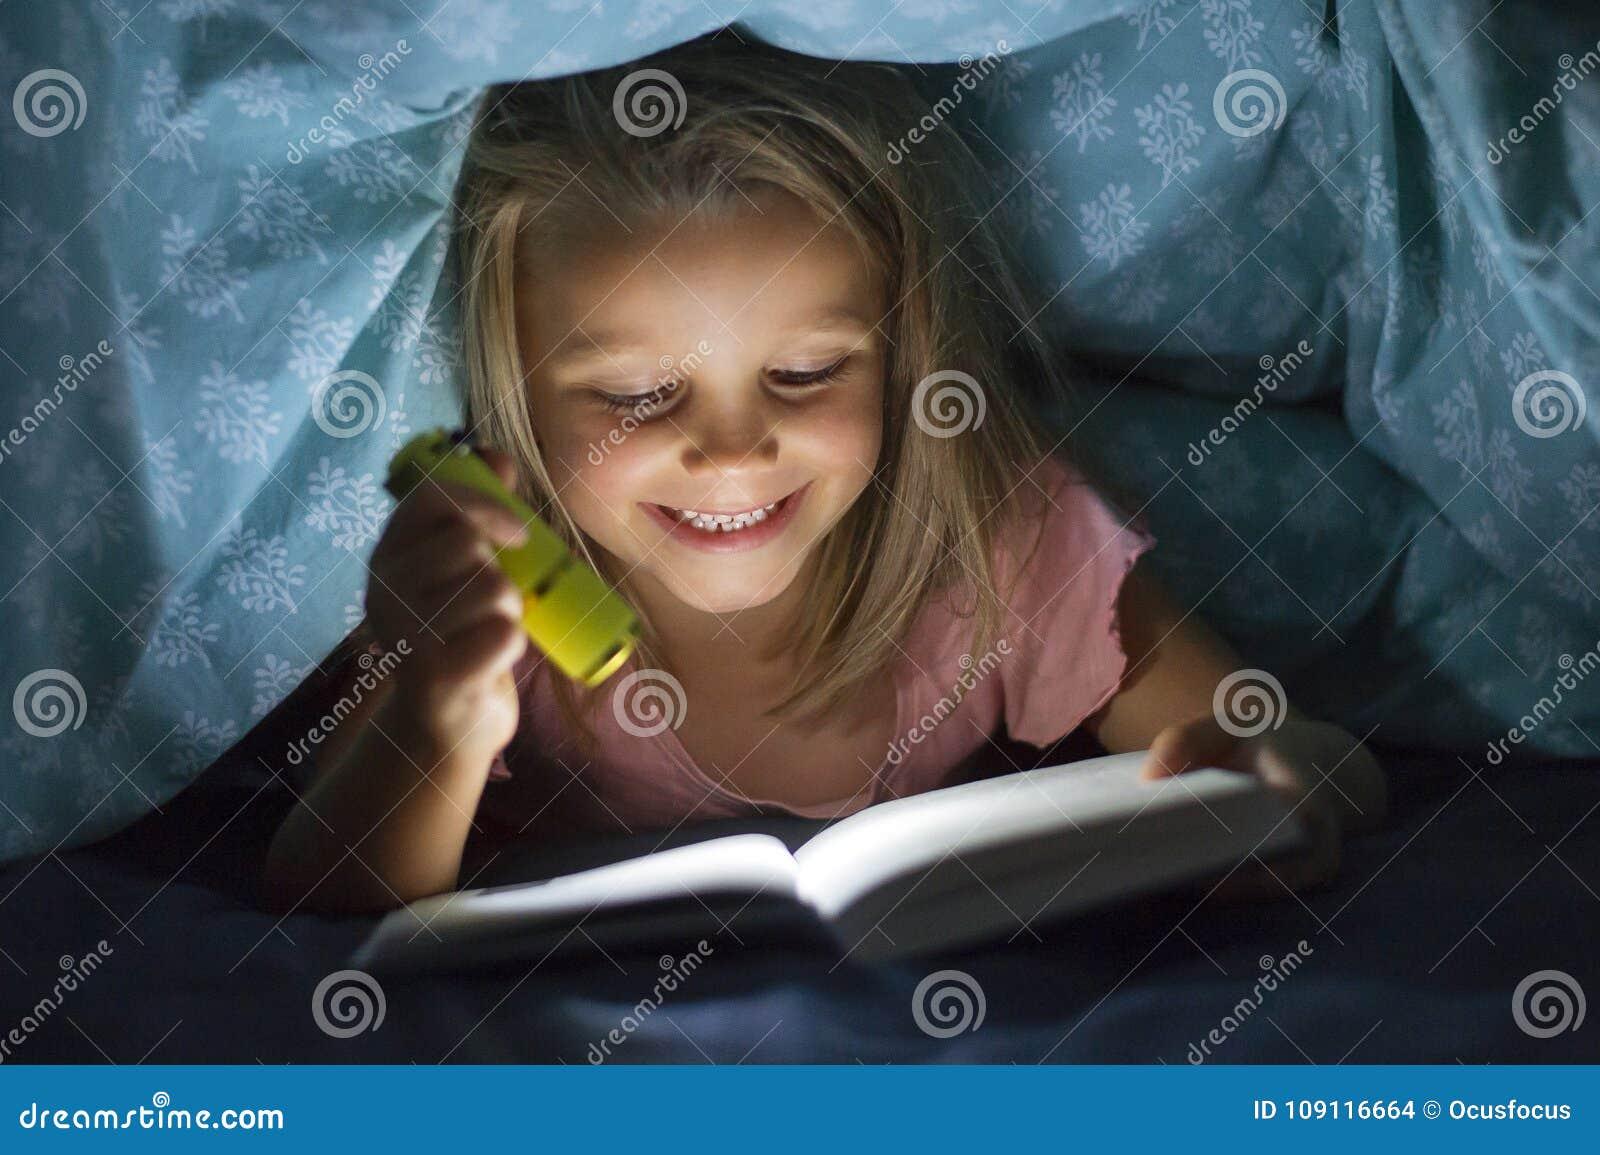 Zoete mooi en mooi weinig blond meisje 6 tot 8 jaar oud onderbed behandelt lezingsboek in dark bij nacht met toortslicht